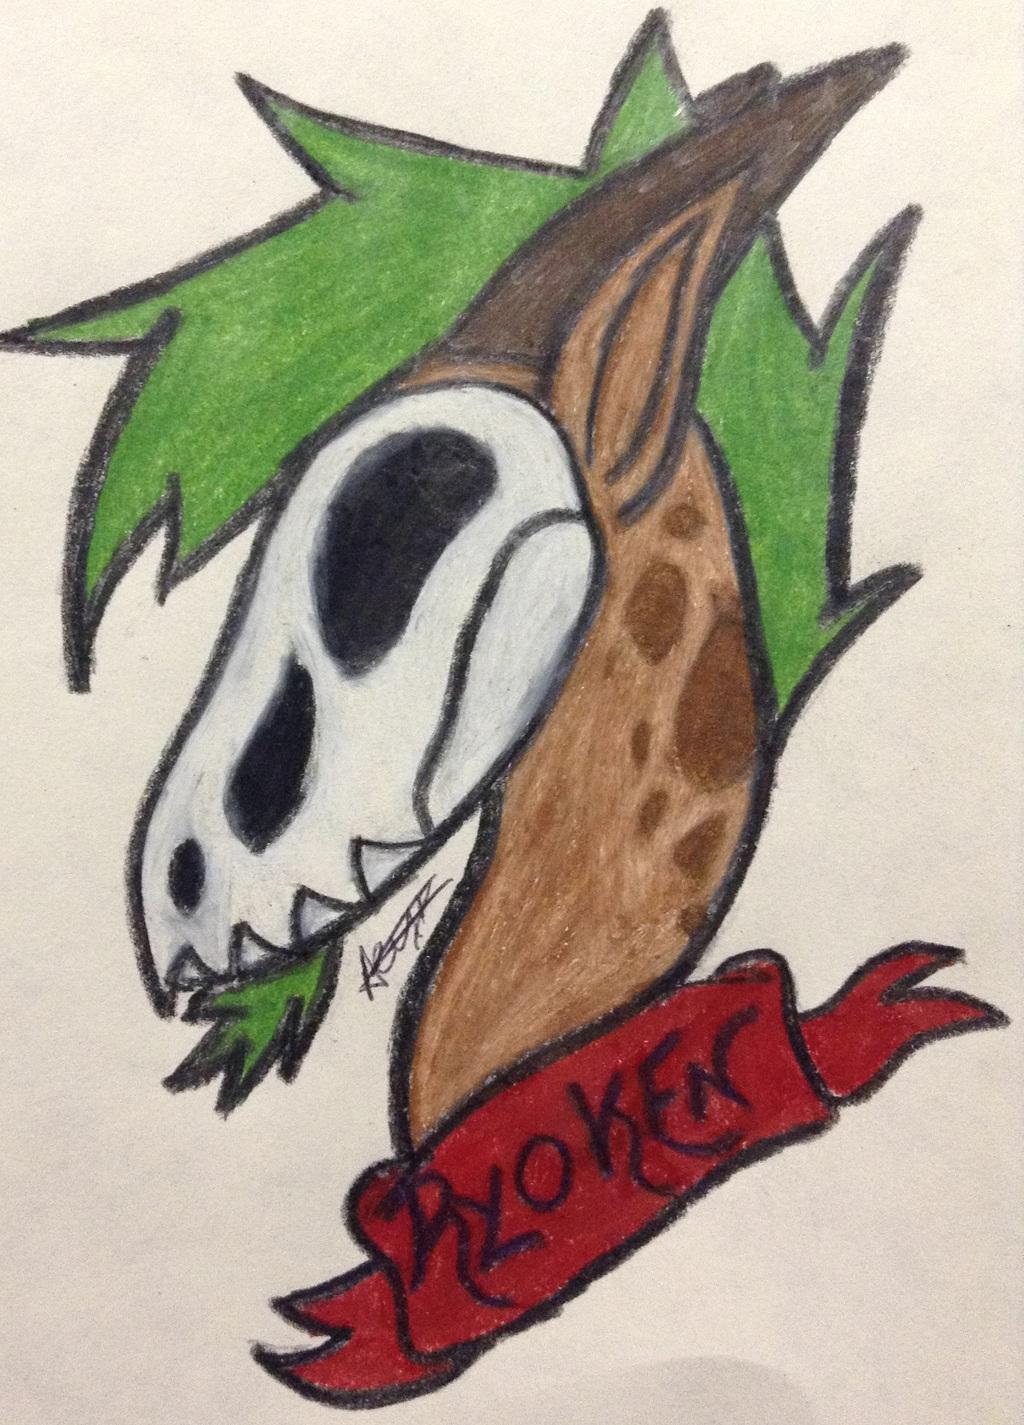 Most recent image: Skull badges